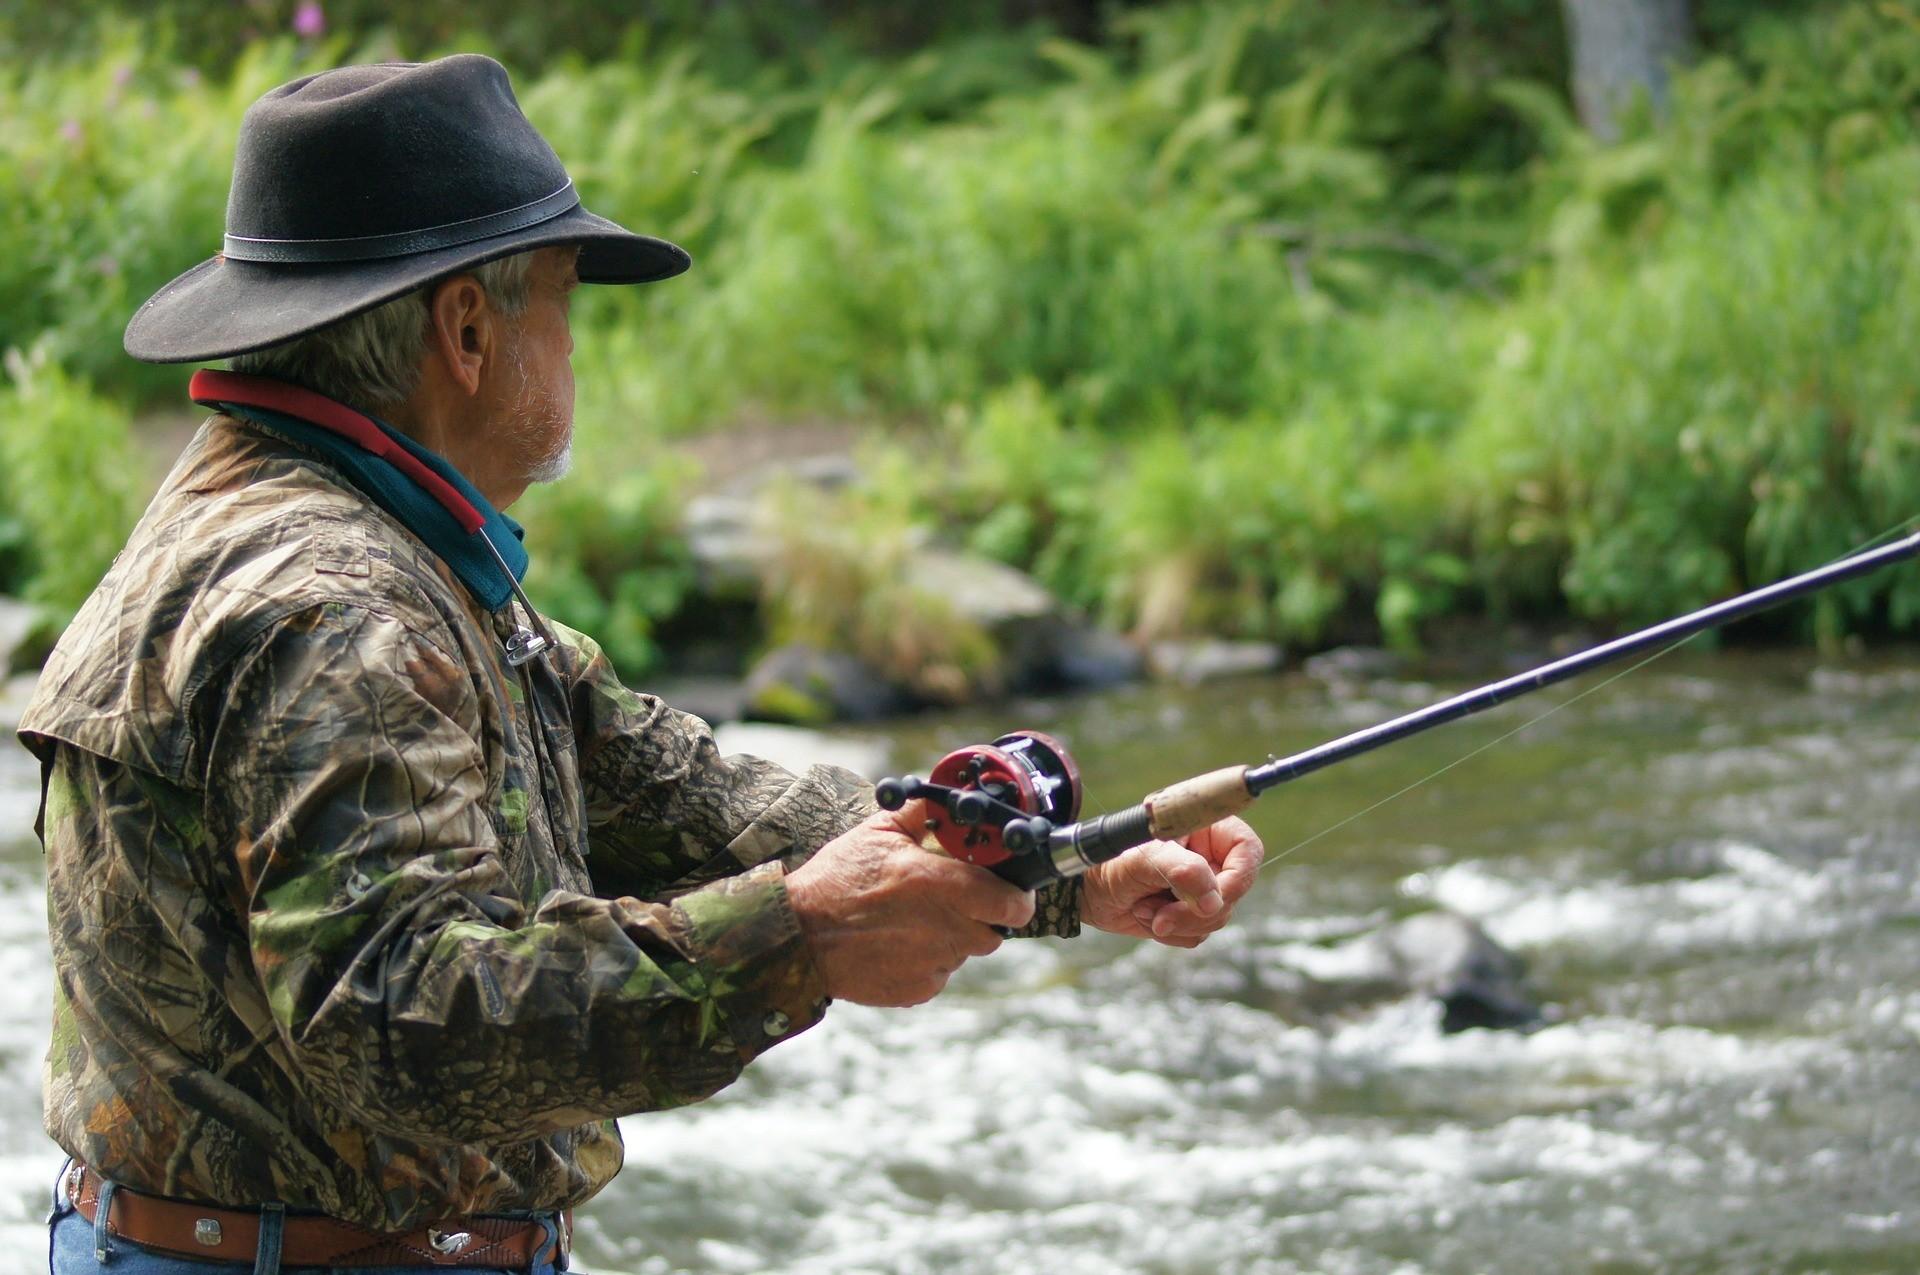 fisherman-585707_1920